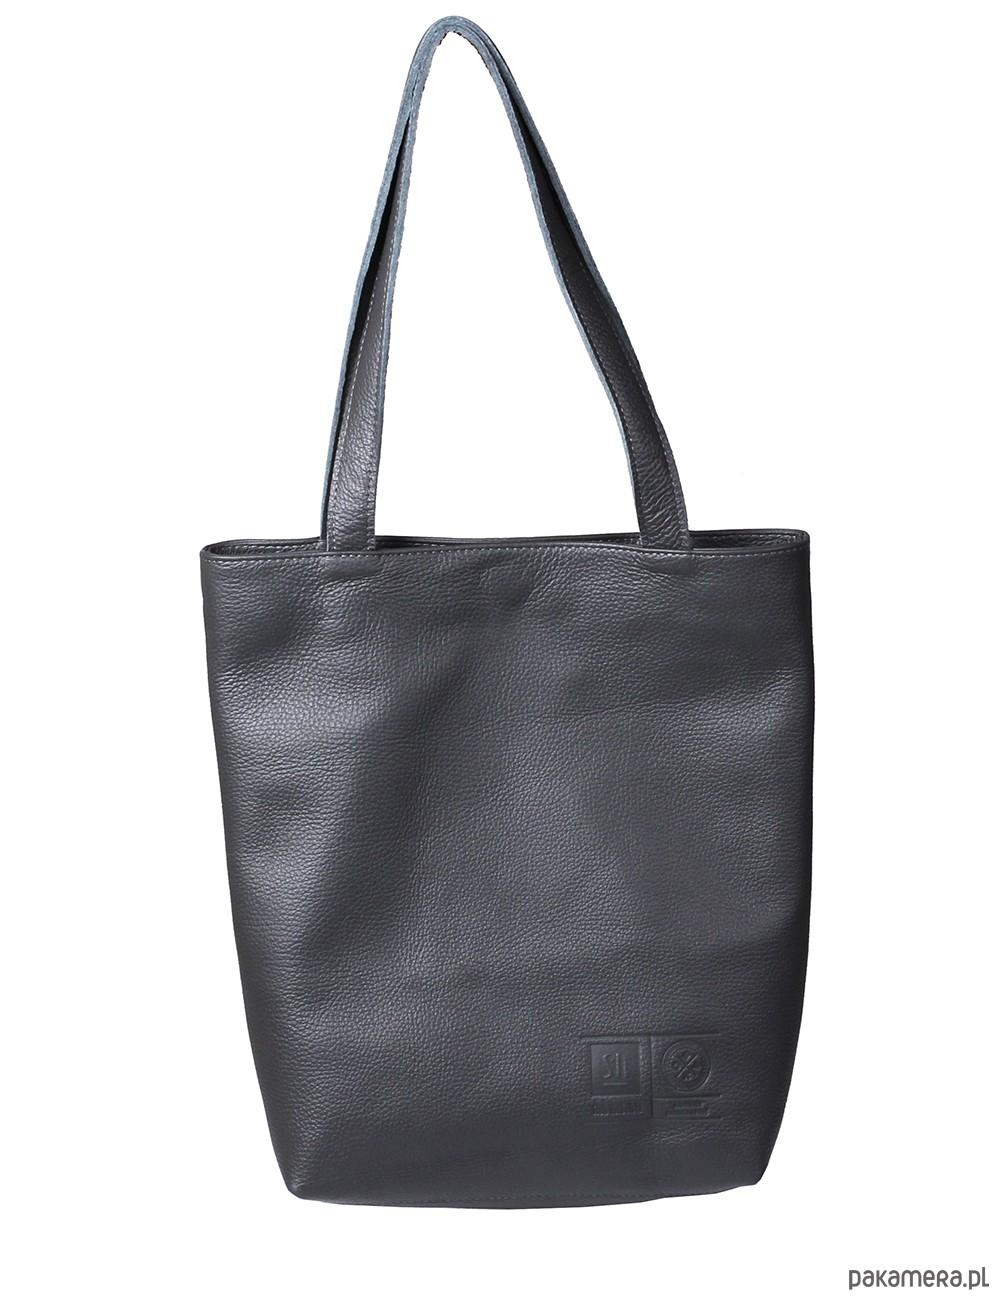 abb8f2b2306cf Torba damska SHOPPER BAG - torby XXL - damskie - Pakamera.pl